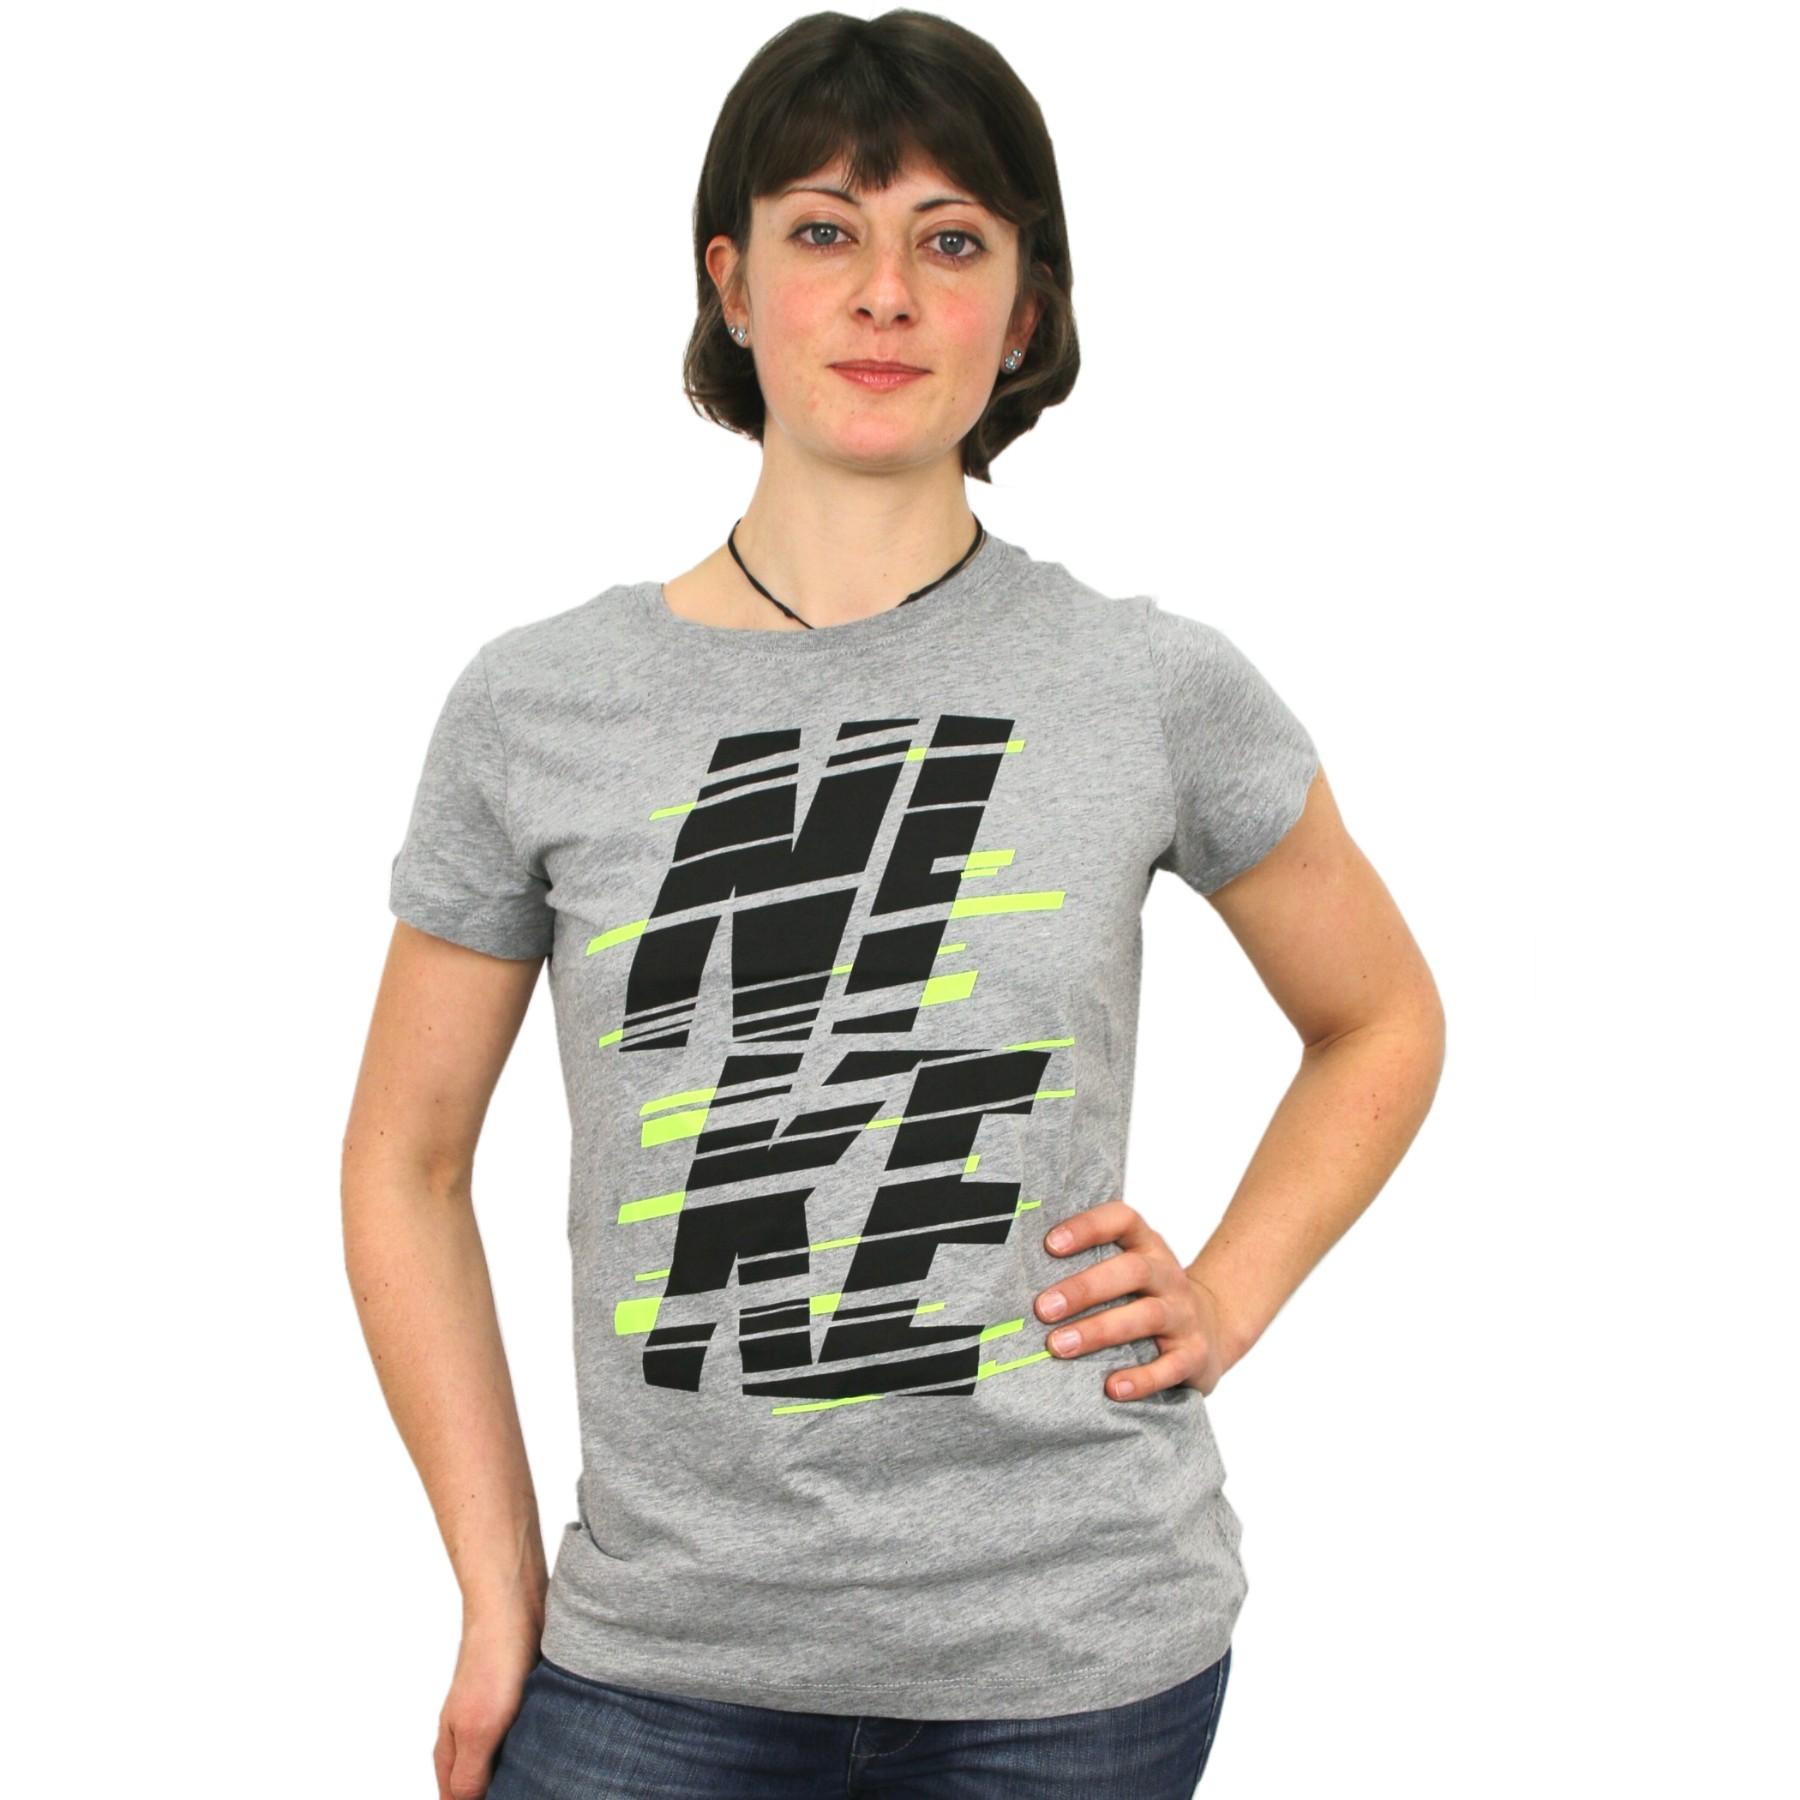 nike tee stack t shirt sportshirt fitnessshirt kurzam damen grau schwarz ebay. Black Bedroom Furniture Sets. Home Design Ideas